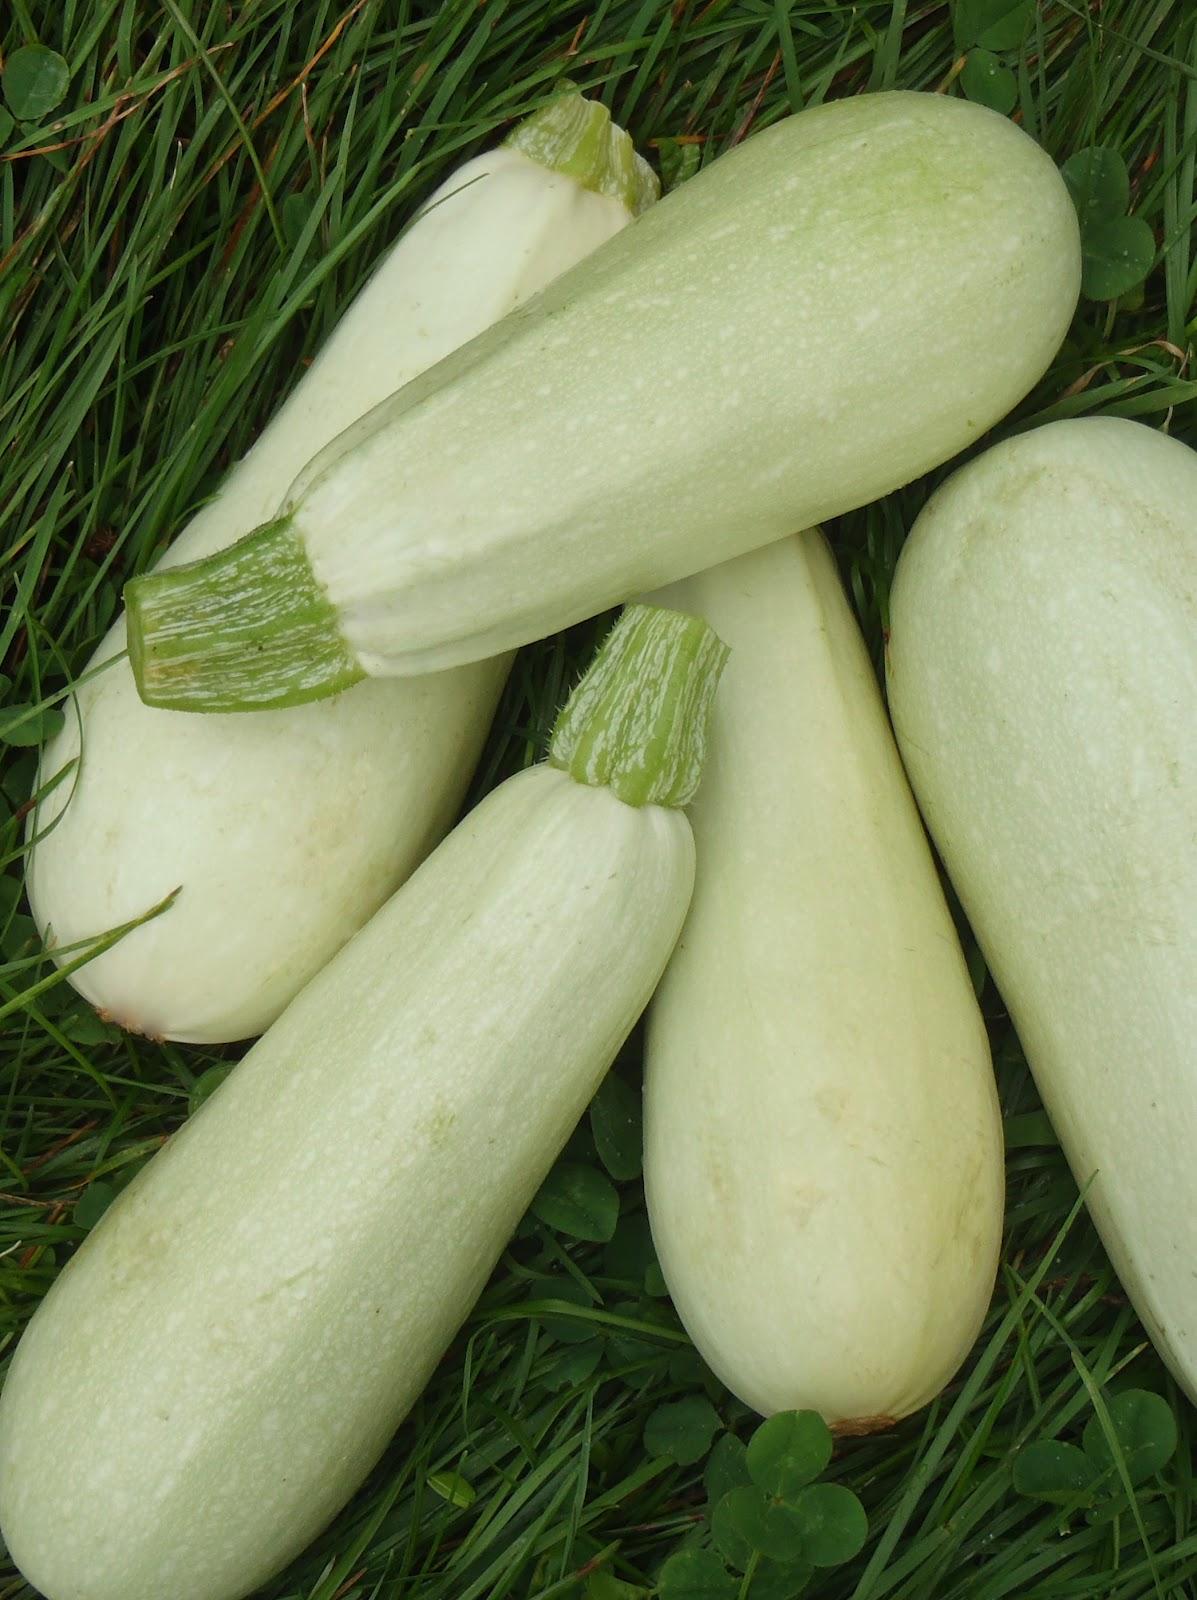 Courges potager ornemental de catherine - Feuille de courgette blanche ...